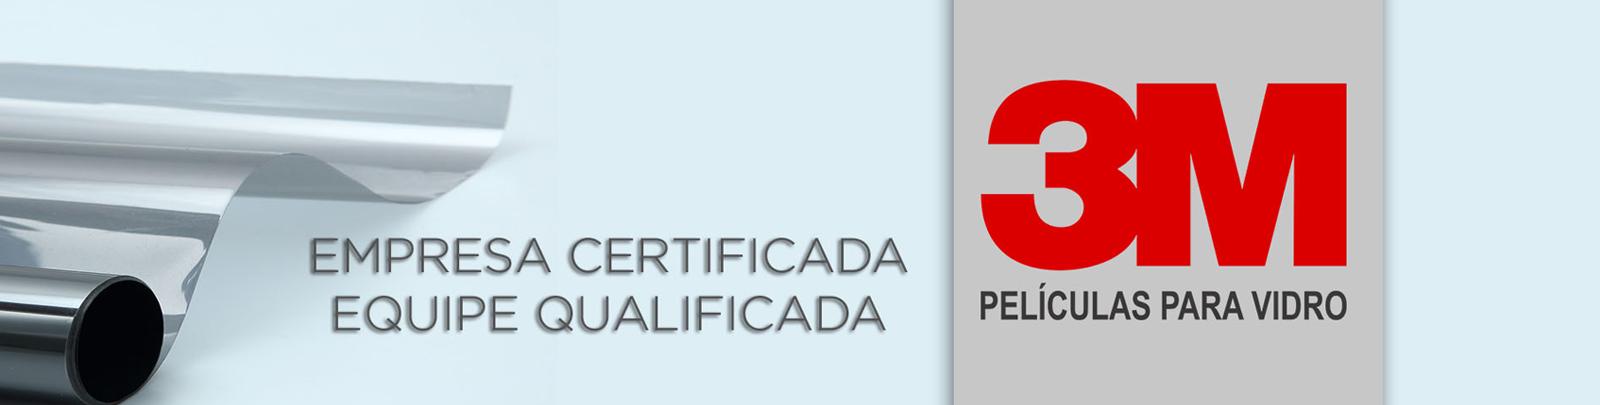 slide-pelicula02